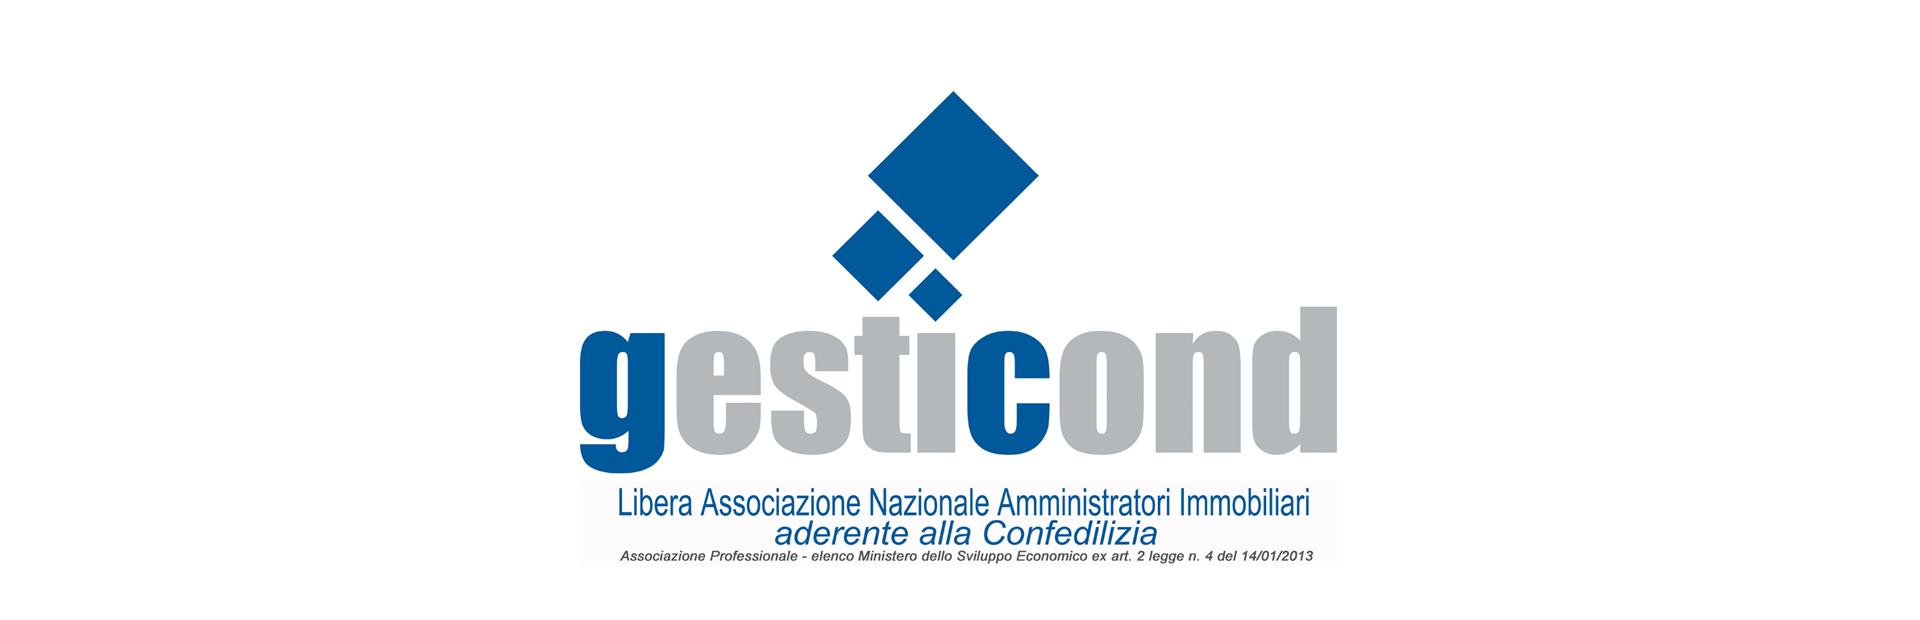 Gesticond1920x620_3